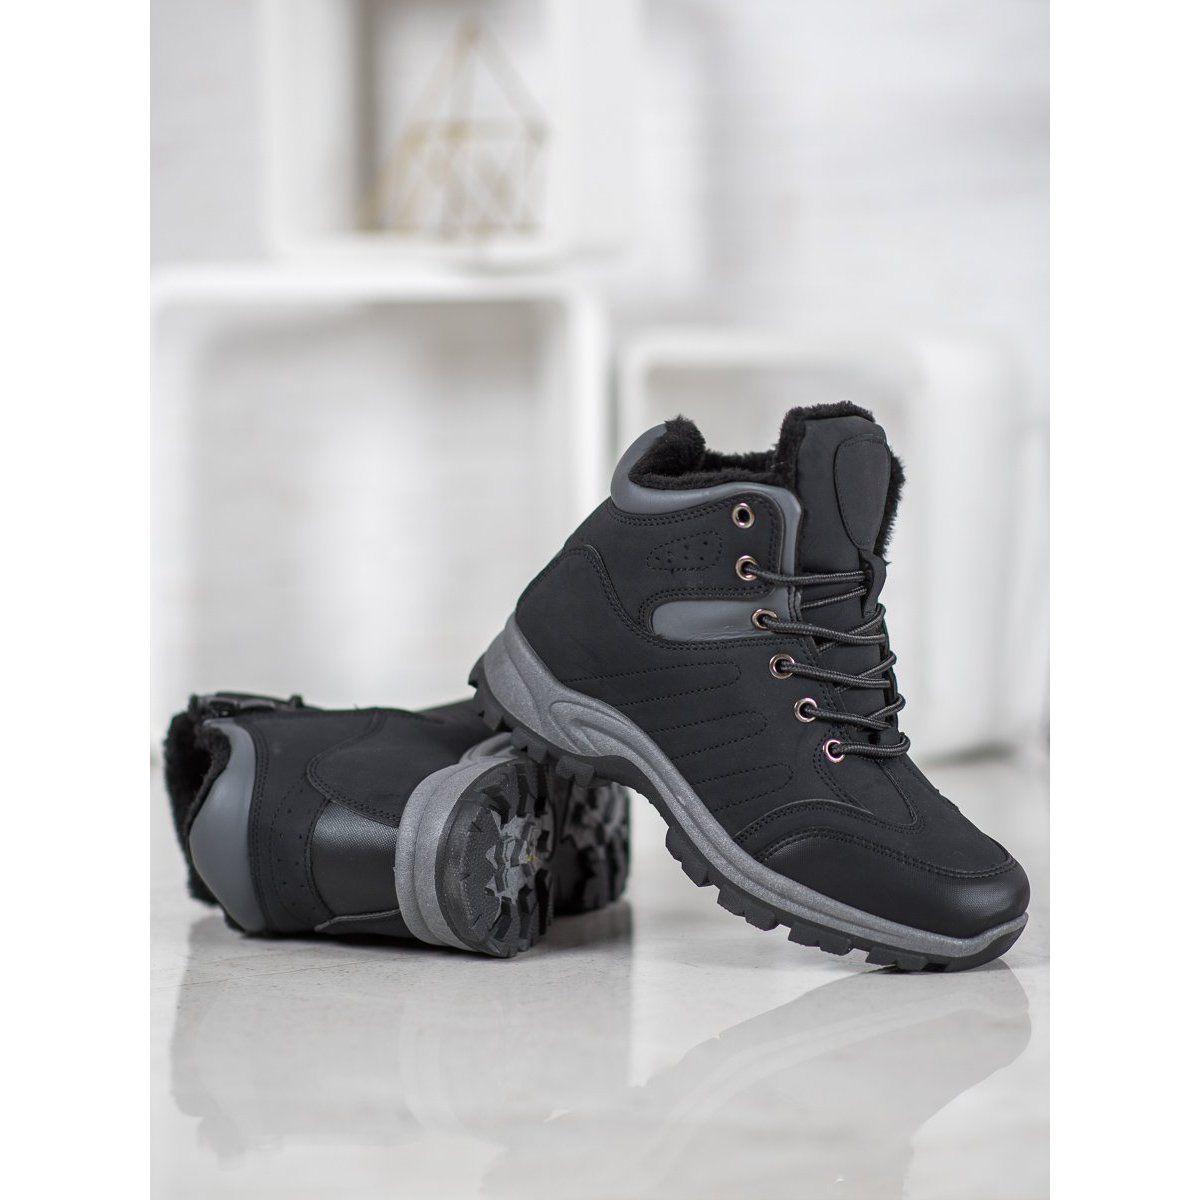 Shelovet Ocieplane Trapery Sportowe Czarne Boots Black Boots Women Womens Boots